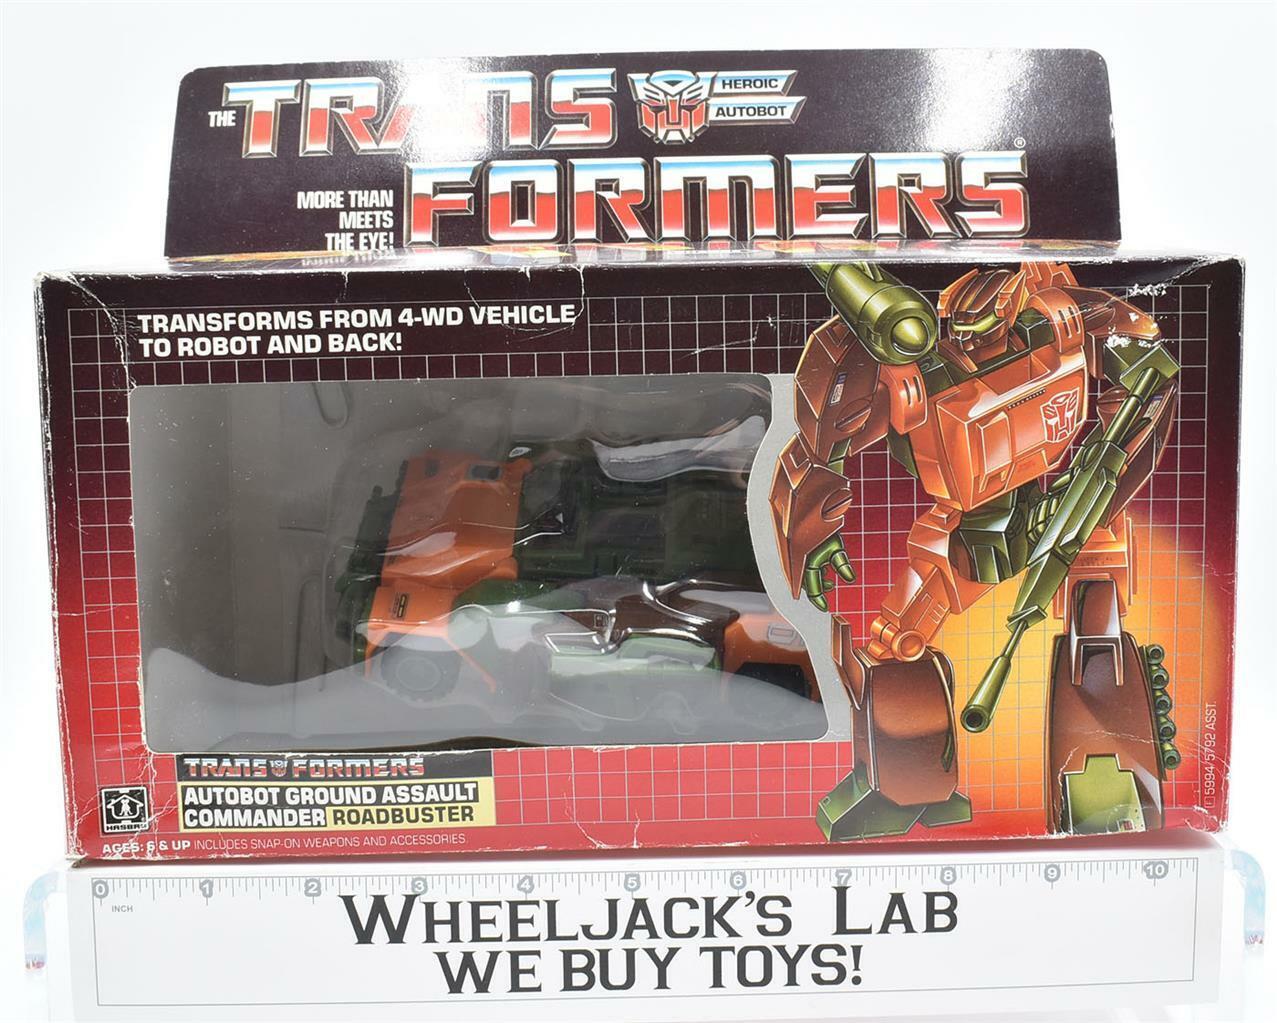 Roadbuster MIB 100% Complete C 1985 Vintage Hasbro Action Figure G1 Transformers